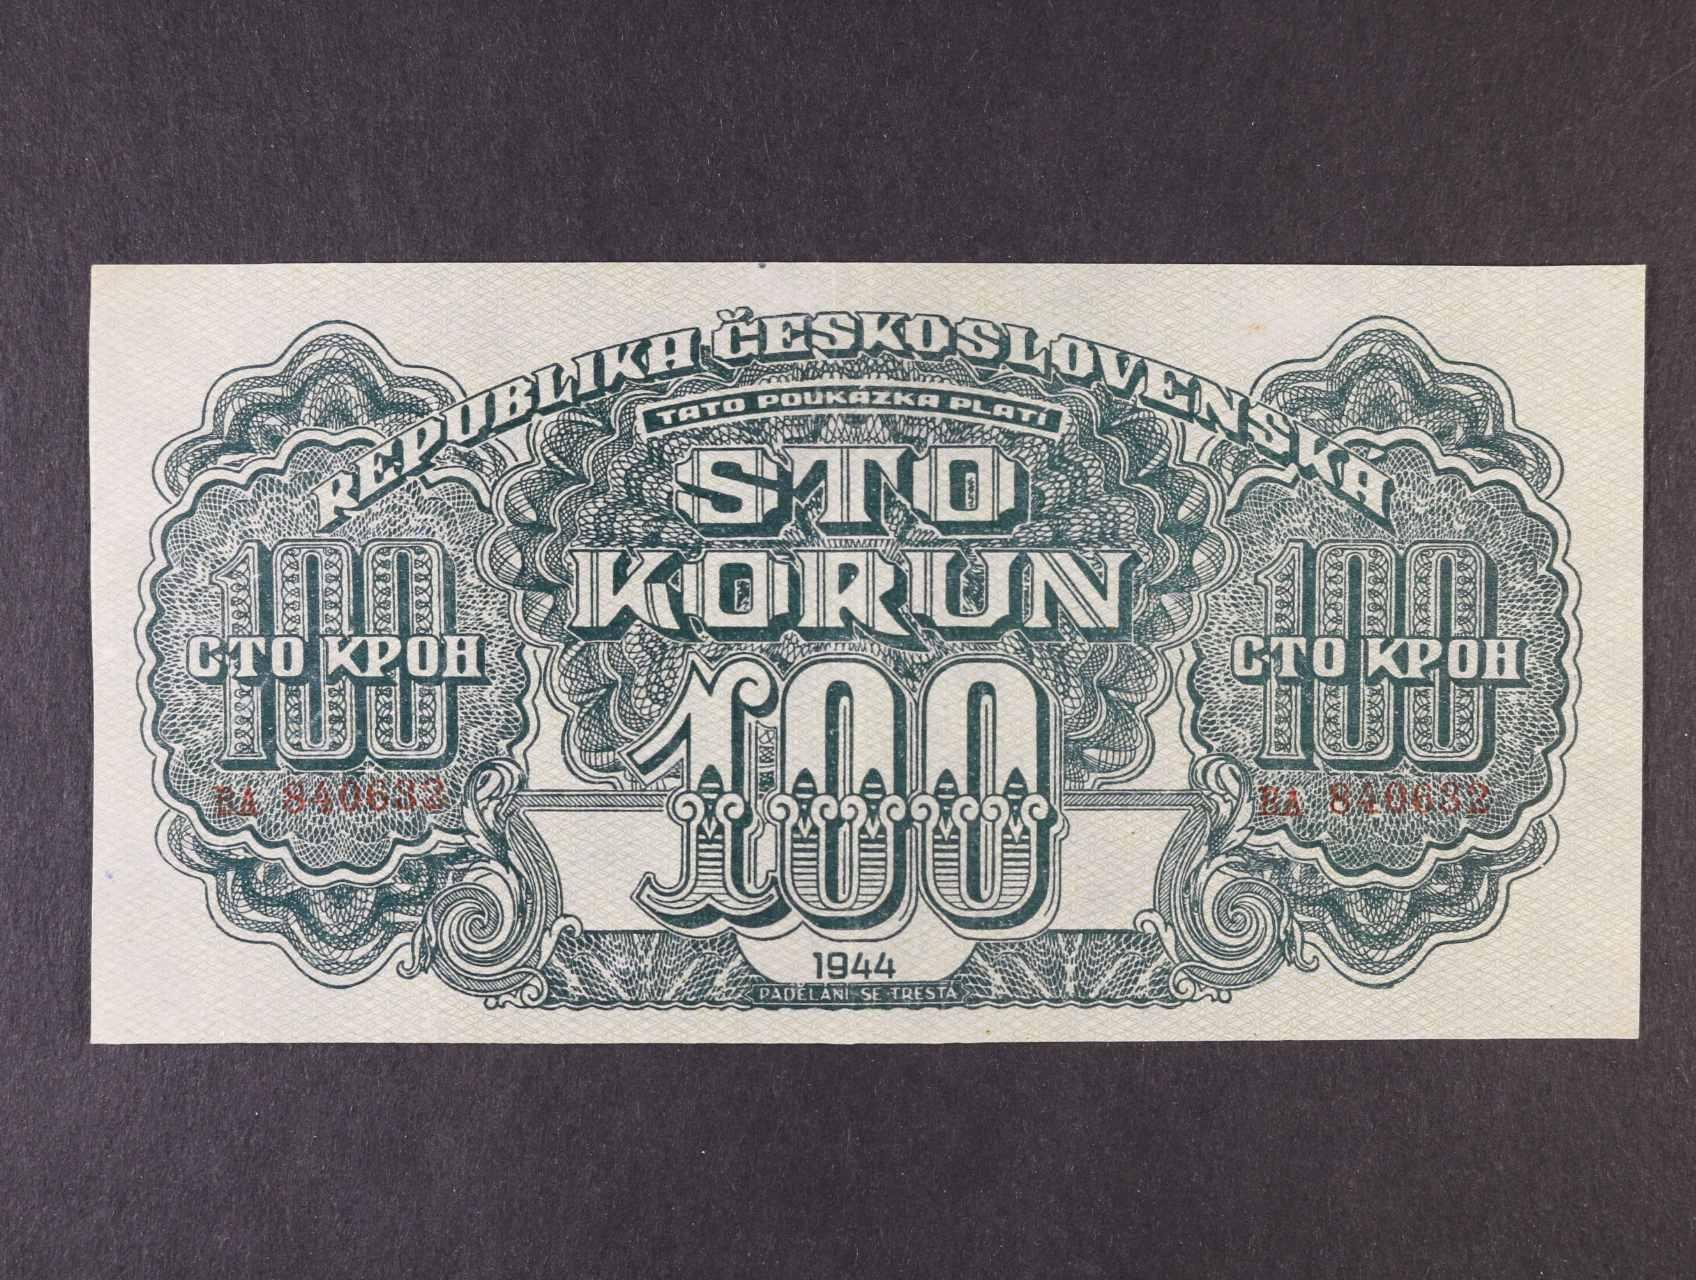 100 K 1944 série BA, číslovač 6b, Ba. 59a1, Pi. 48a